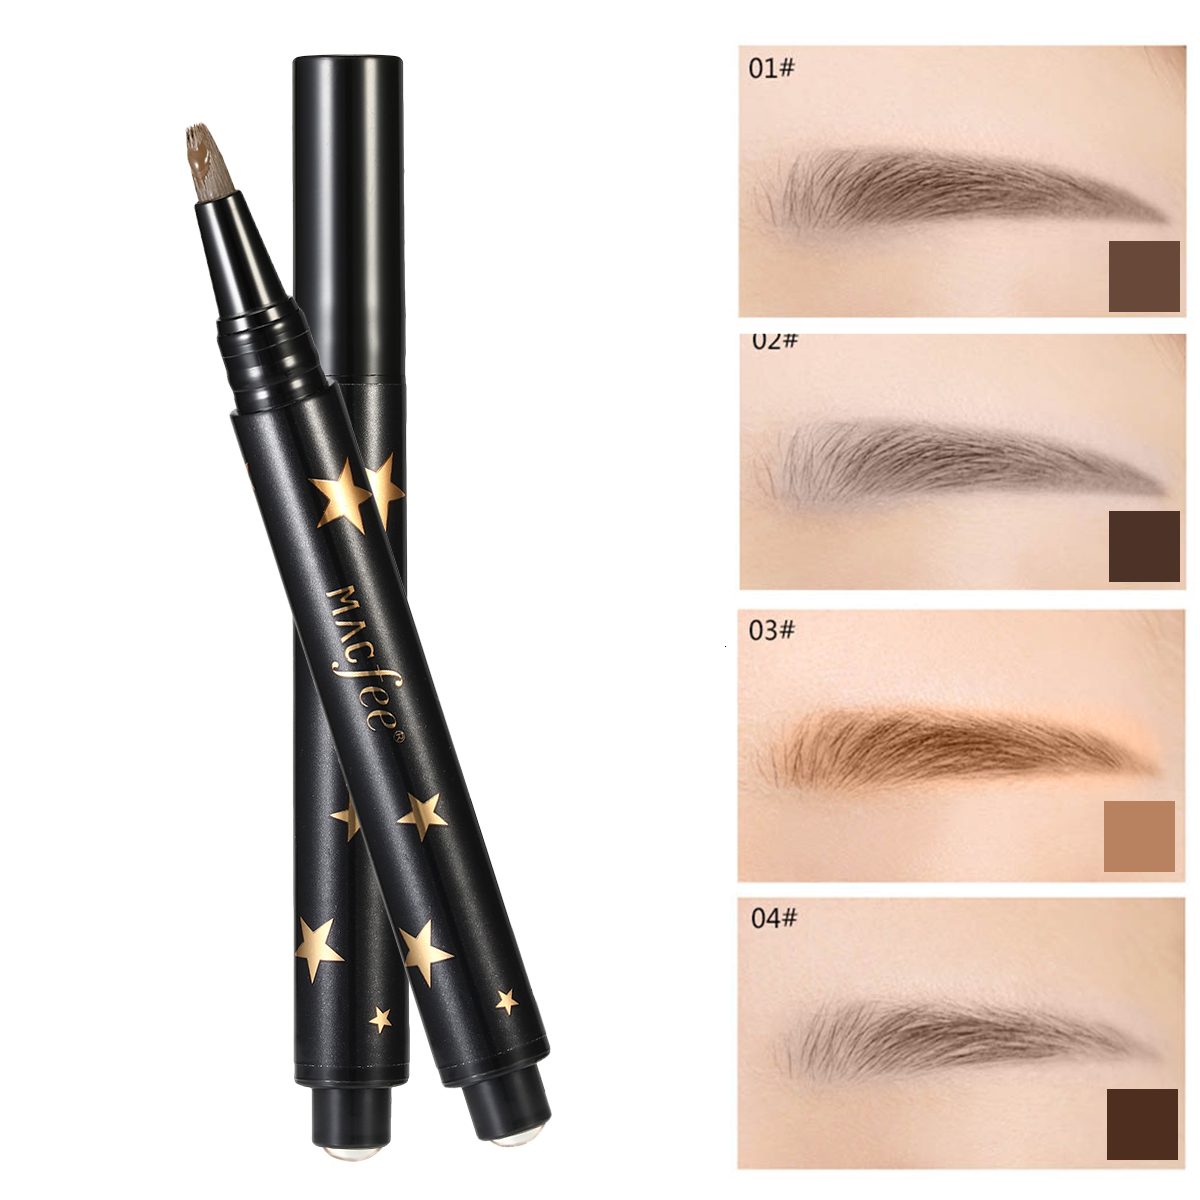 New Brand Natural Brown Eye Brow Tattoo Pen Maleup Kit Long Lasting Waterproof Press-type Liquid Henna Eyebrow Pencil Make Up